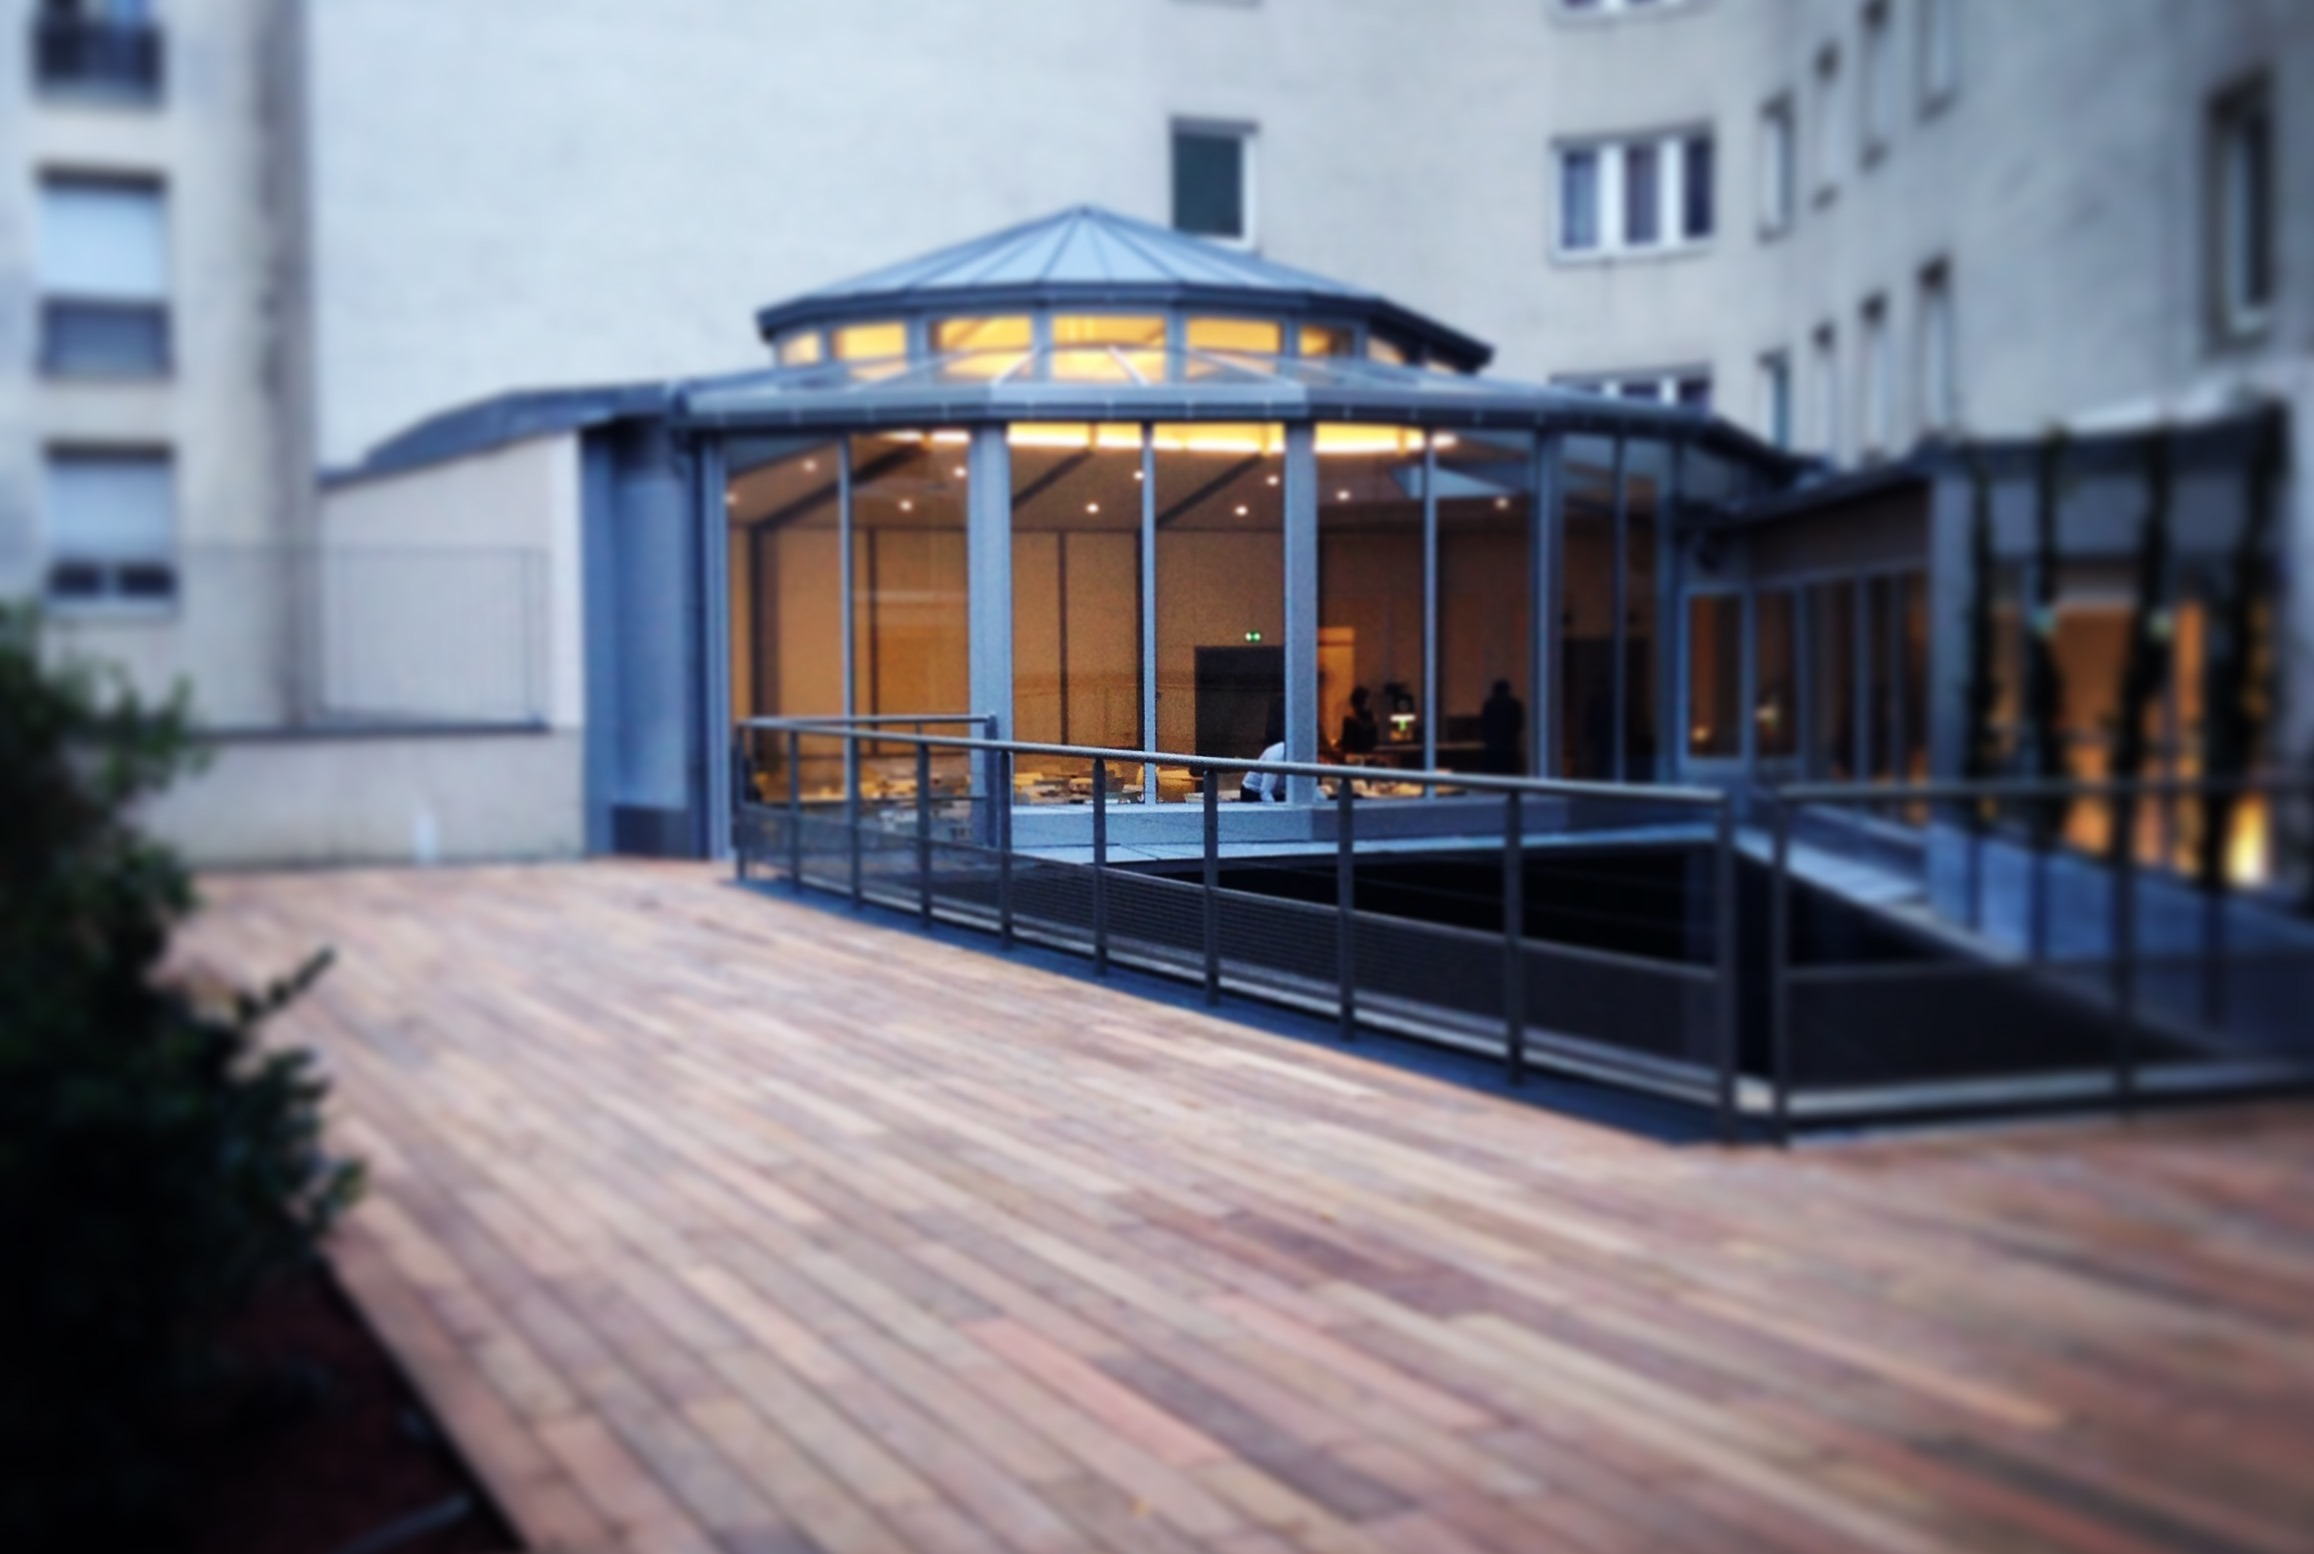 Salle holiday inn paris porte de clichy seminairederniereminute - Porte de clichy restaurant ...